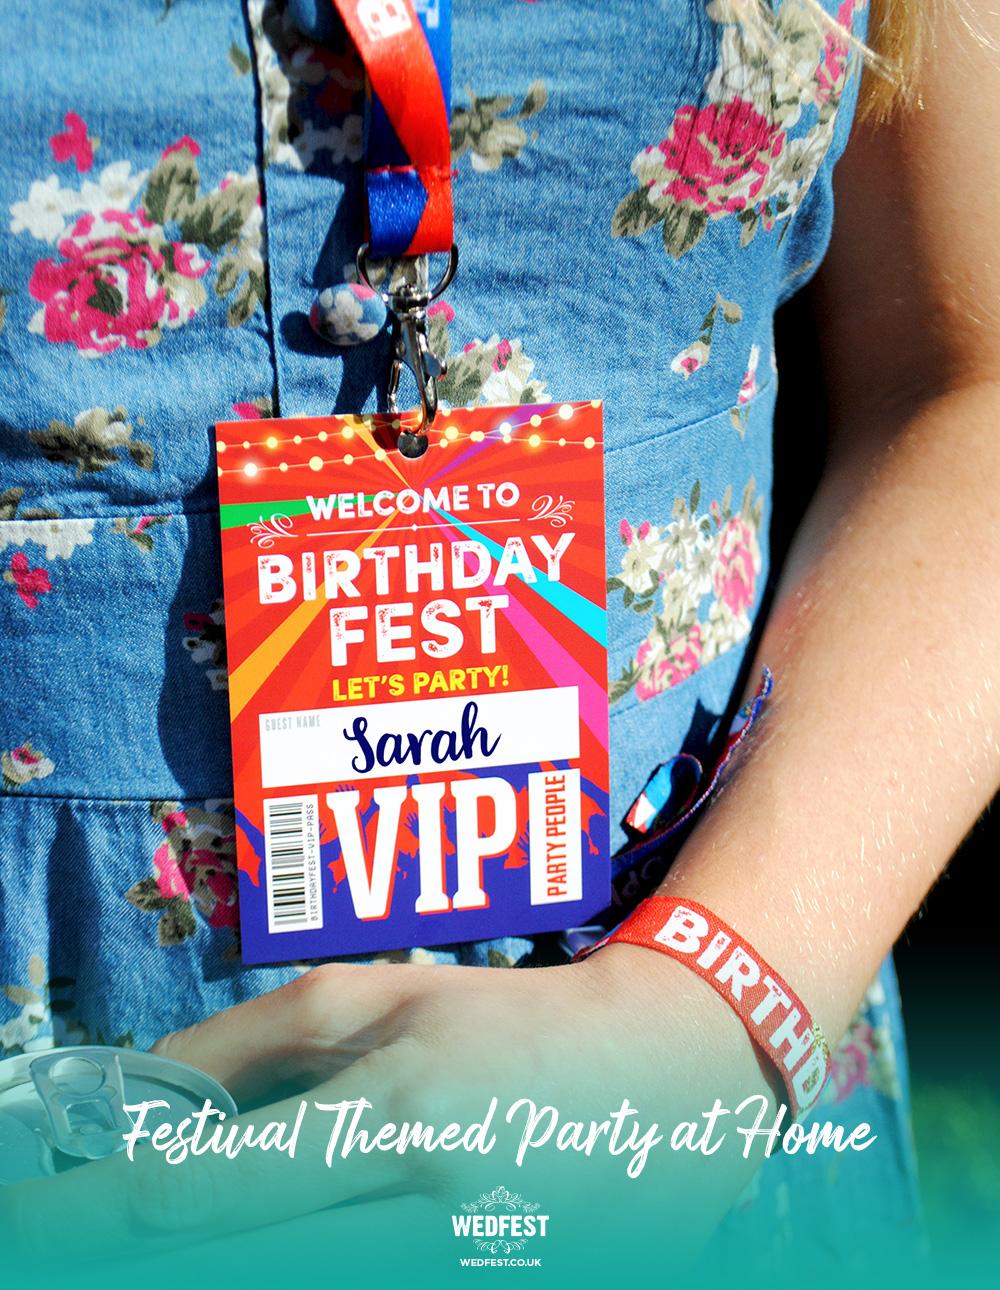 festival birthday party vip lanyards